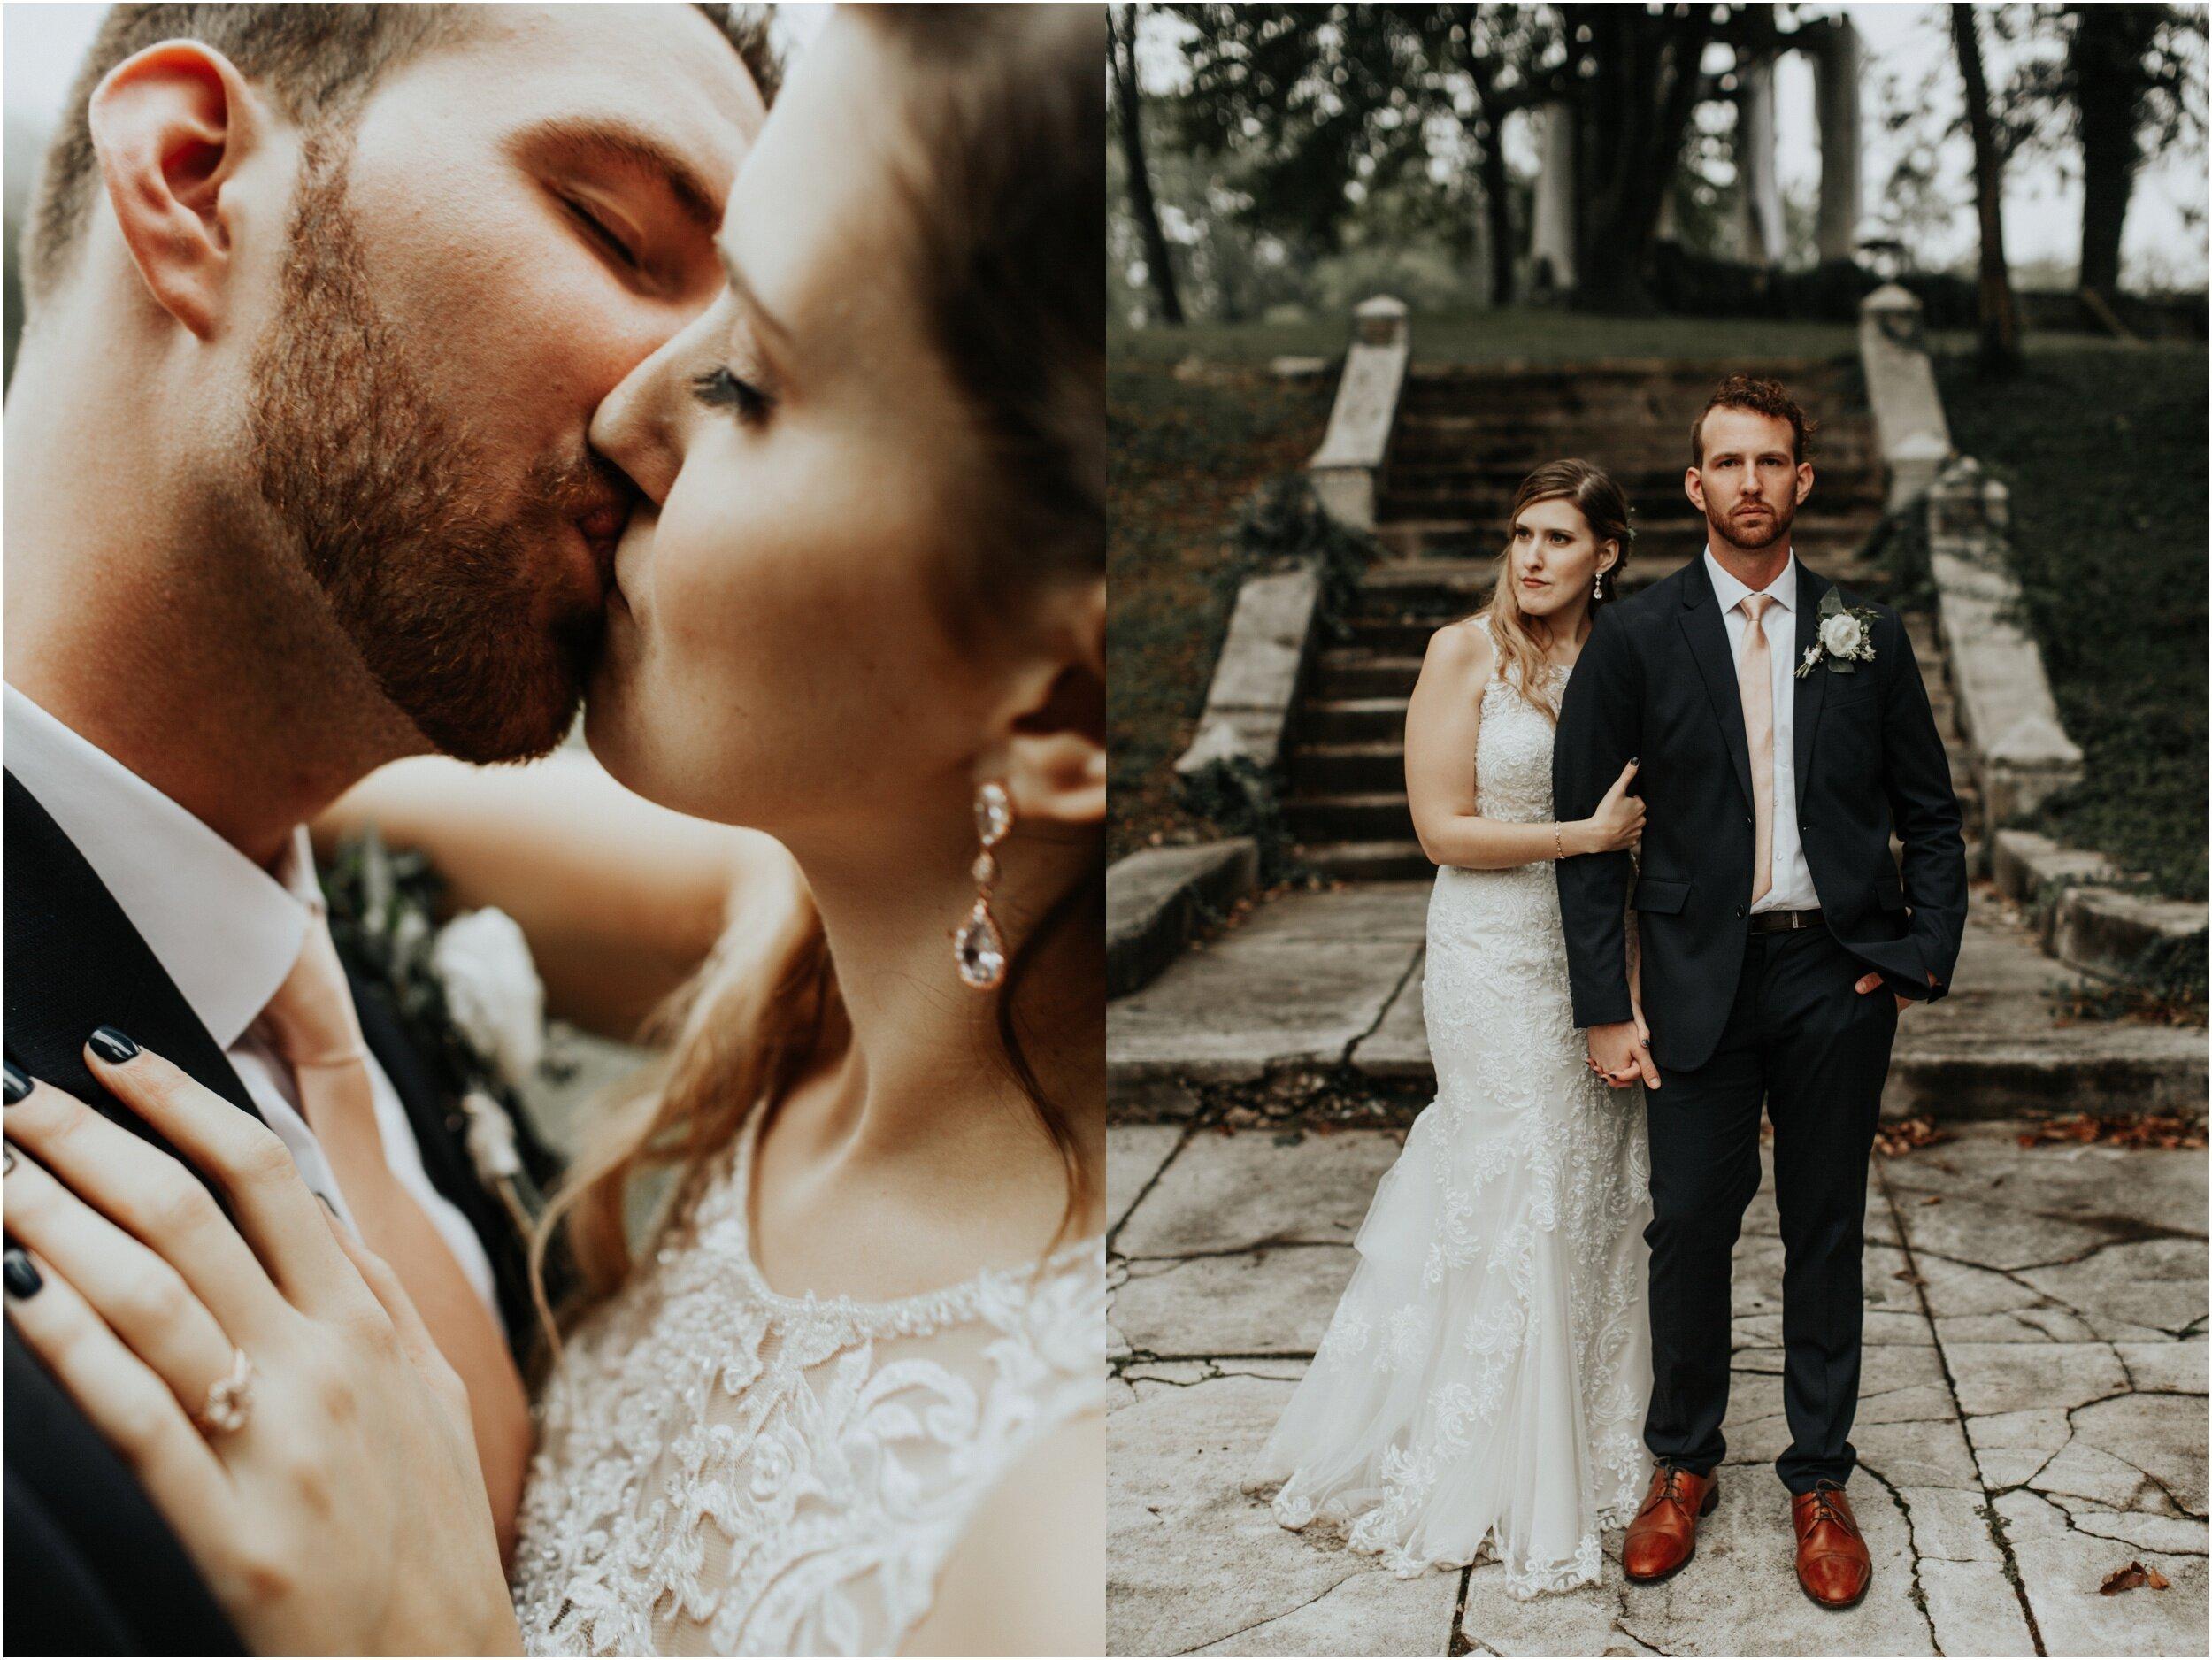 steph-and-jordan-cox-our-wedding-historic-shady-lane-compass-wedding-collective-hazel-lining-photography-destination-elopement-wedding-engagement-photography_0070.jpg